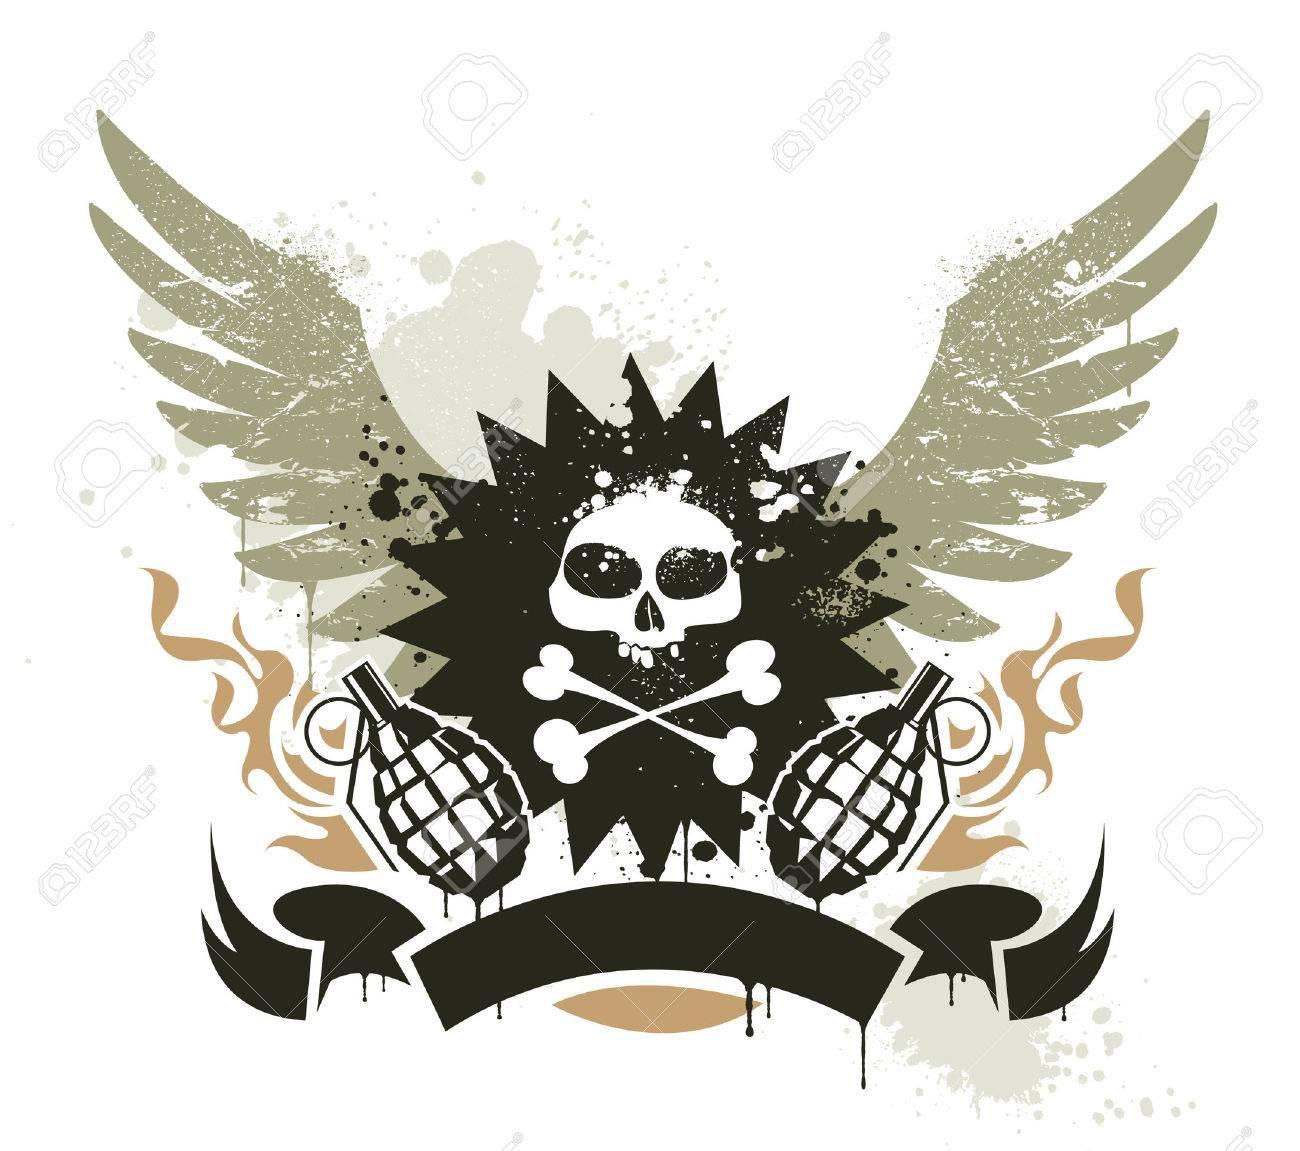 Grunge gang design. Stock Vector - 8258248